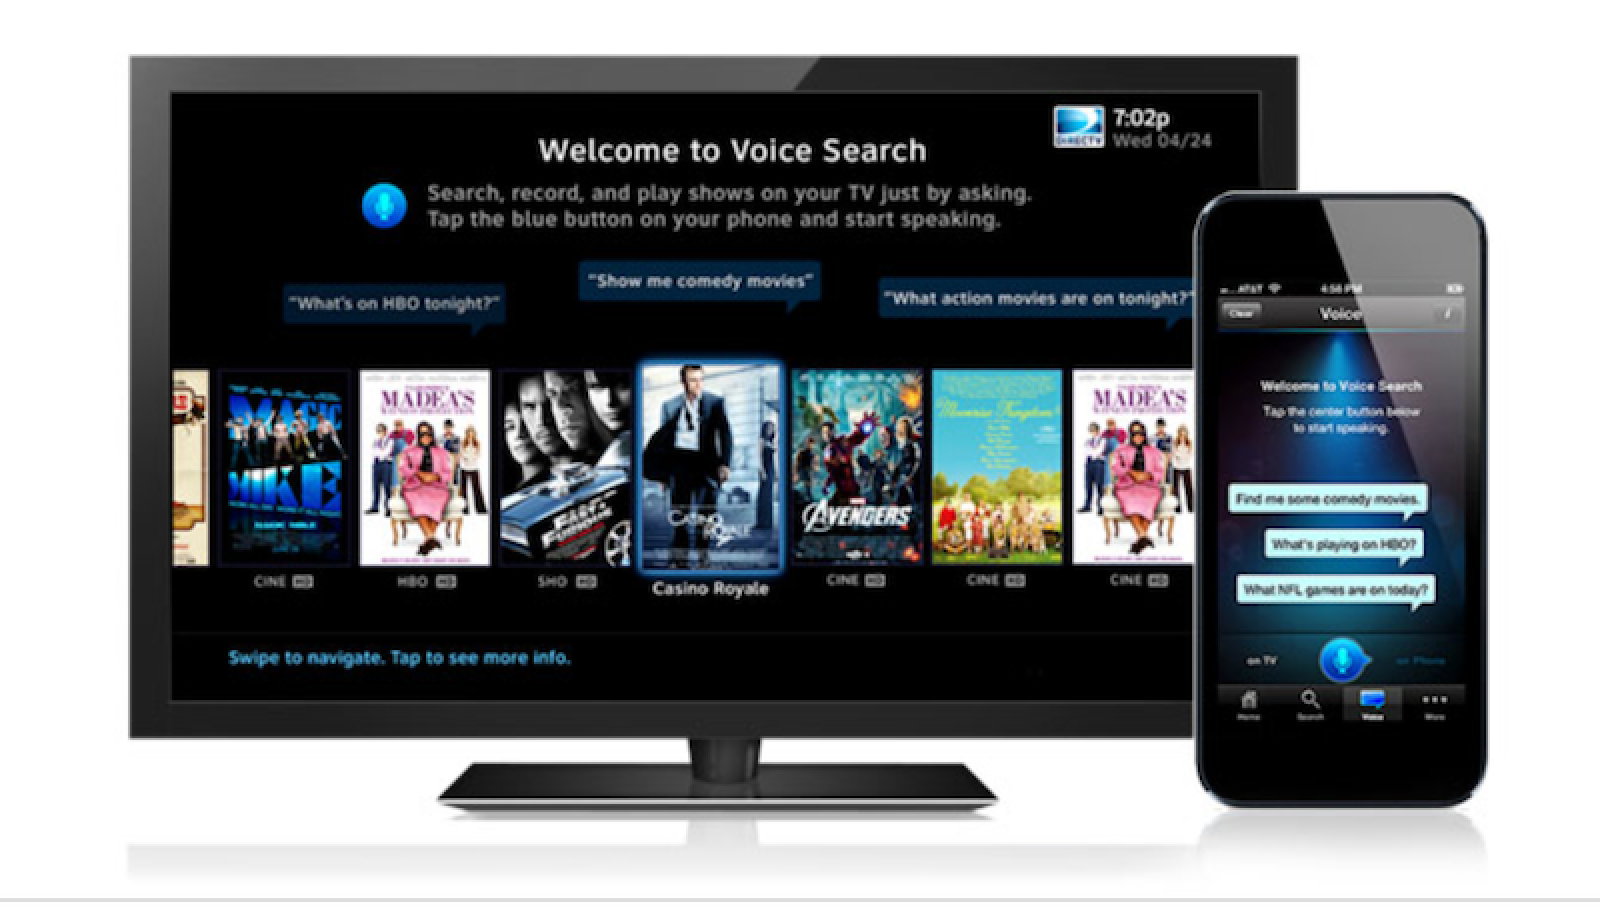 directv updates iphone app with voice commands mac rumors. Black Bedroom Furniture Sets. Home Design Ideas